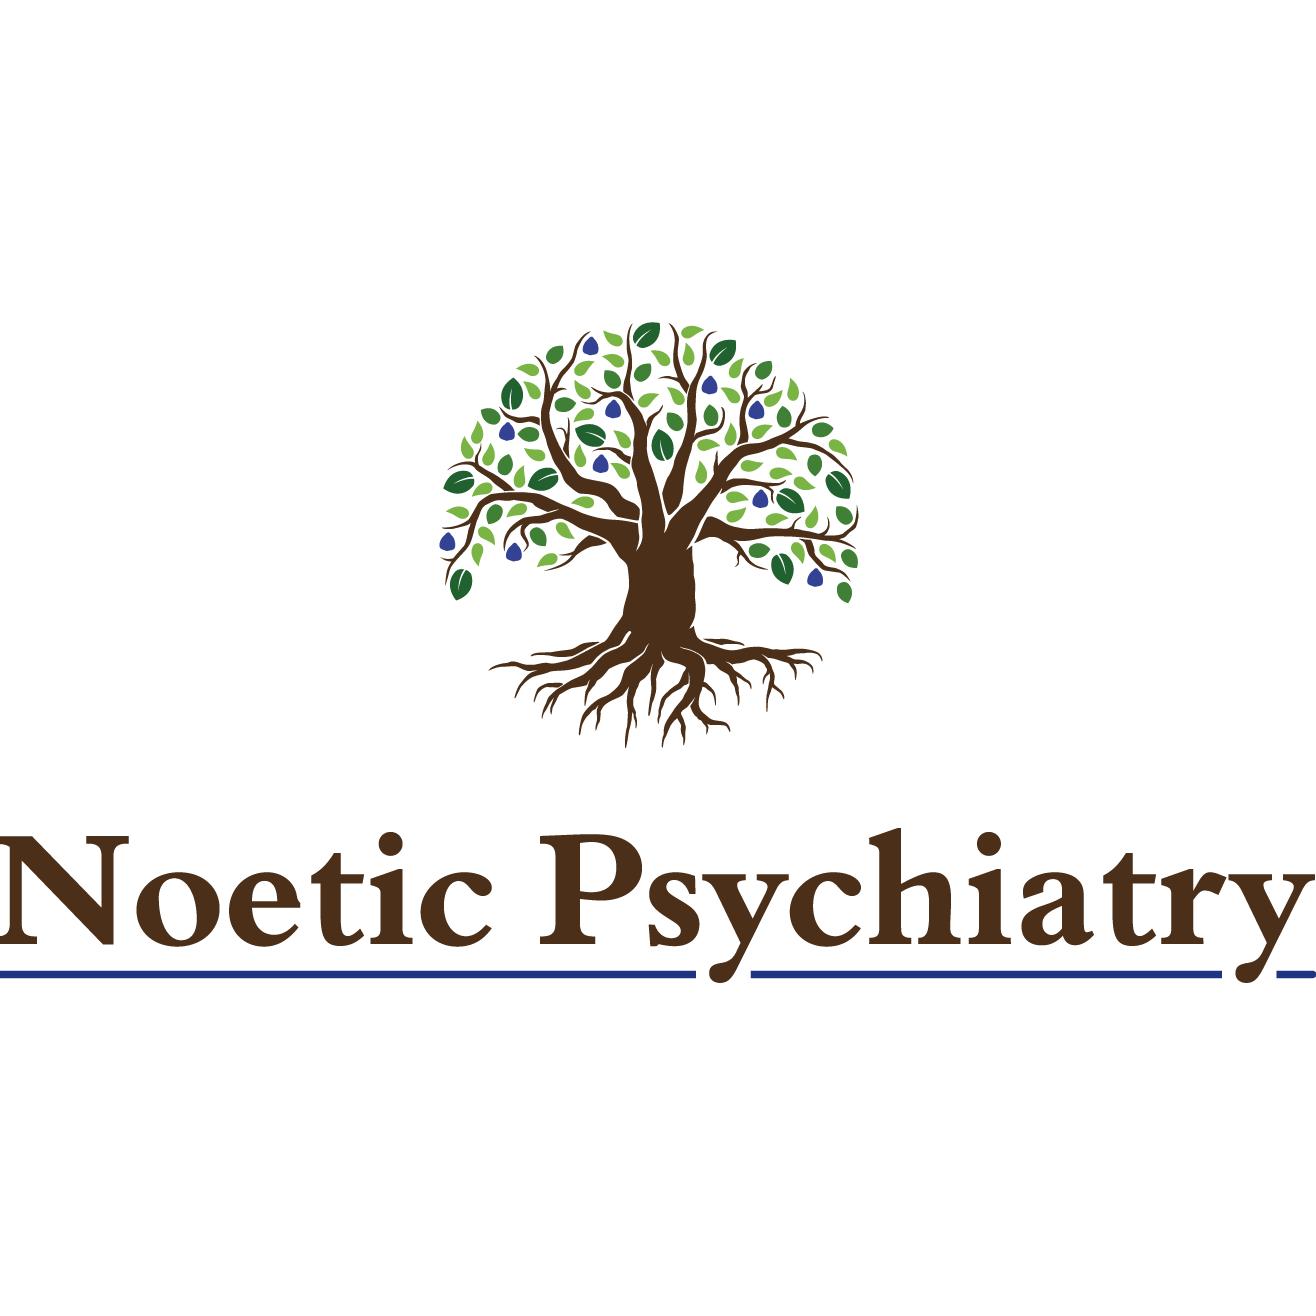 Noetic Psychiatry image 1